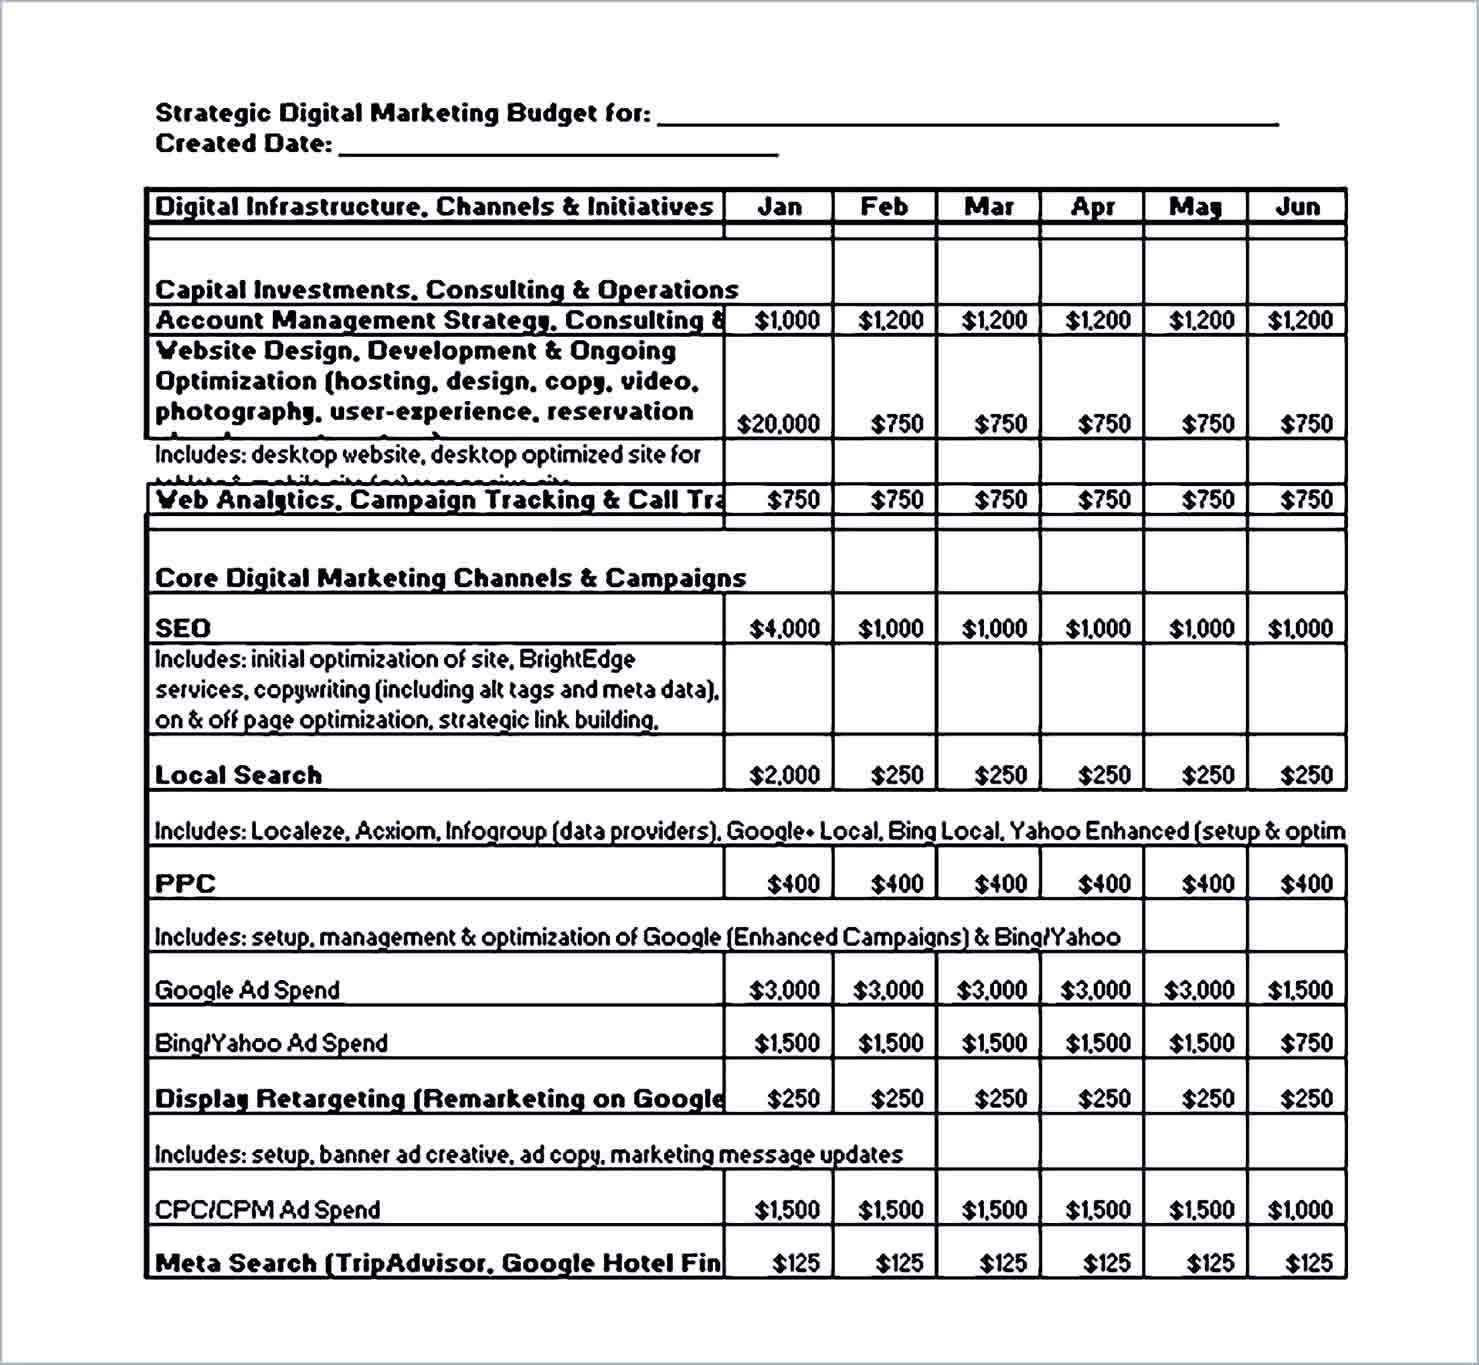 Sample Strategic Digital Marketing Budget